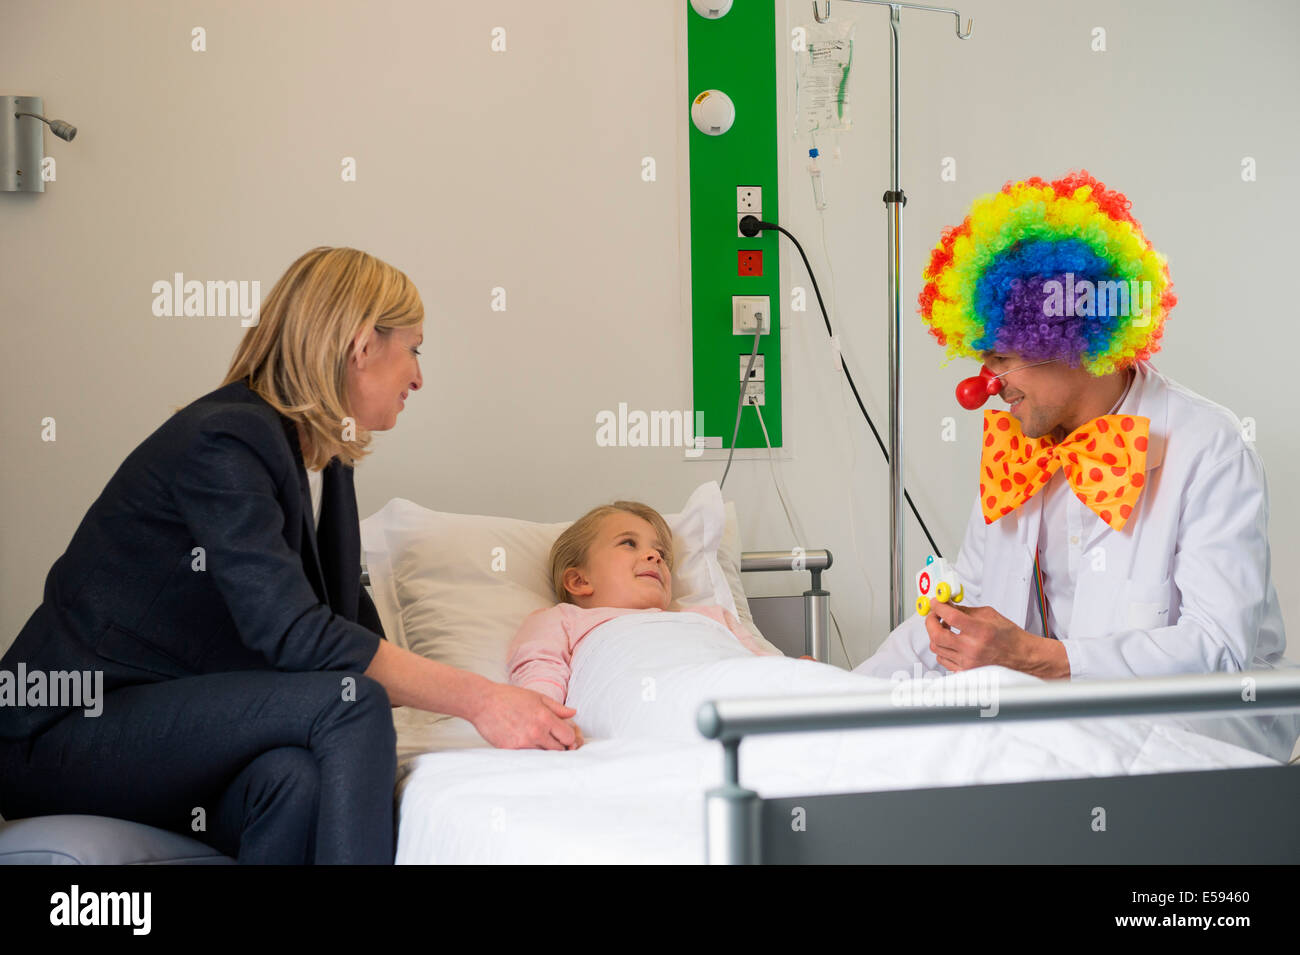 Médecin homme portant costume clown fille faisant sourire patient in hospital bed Photo Stock